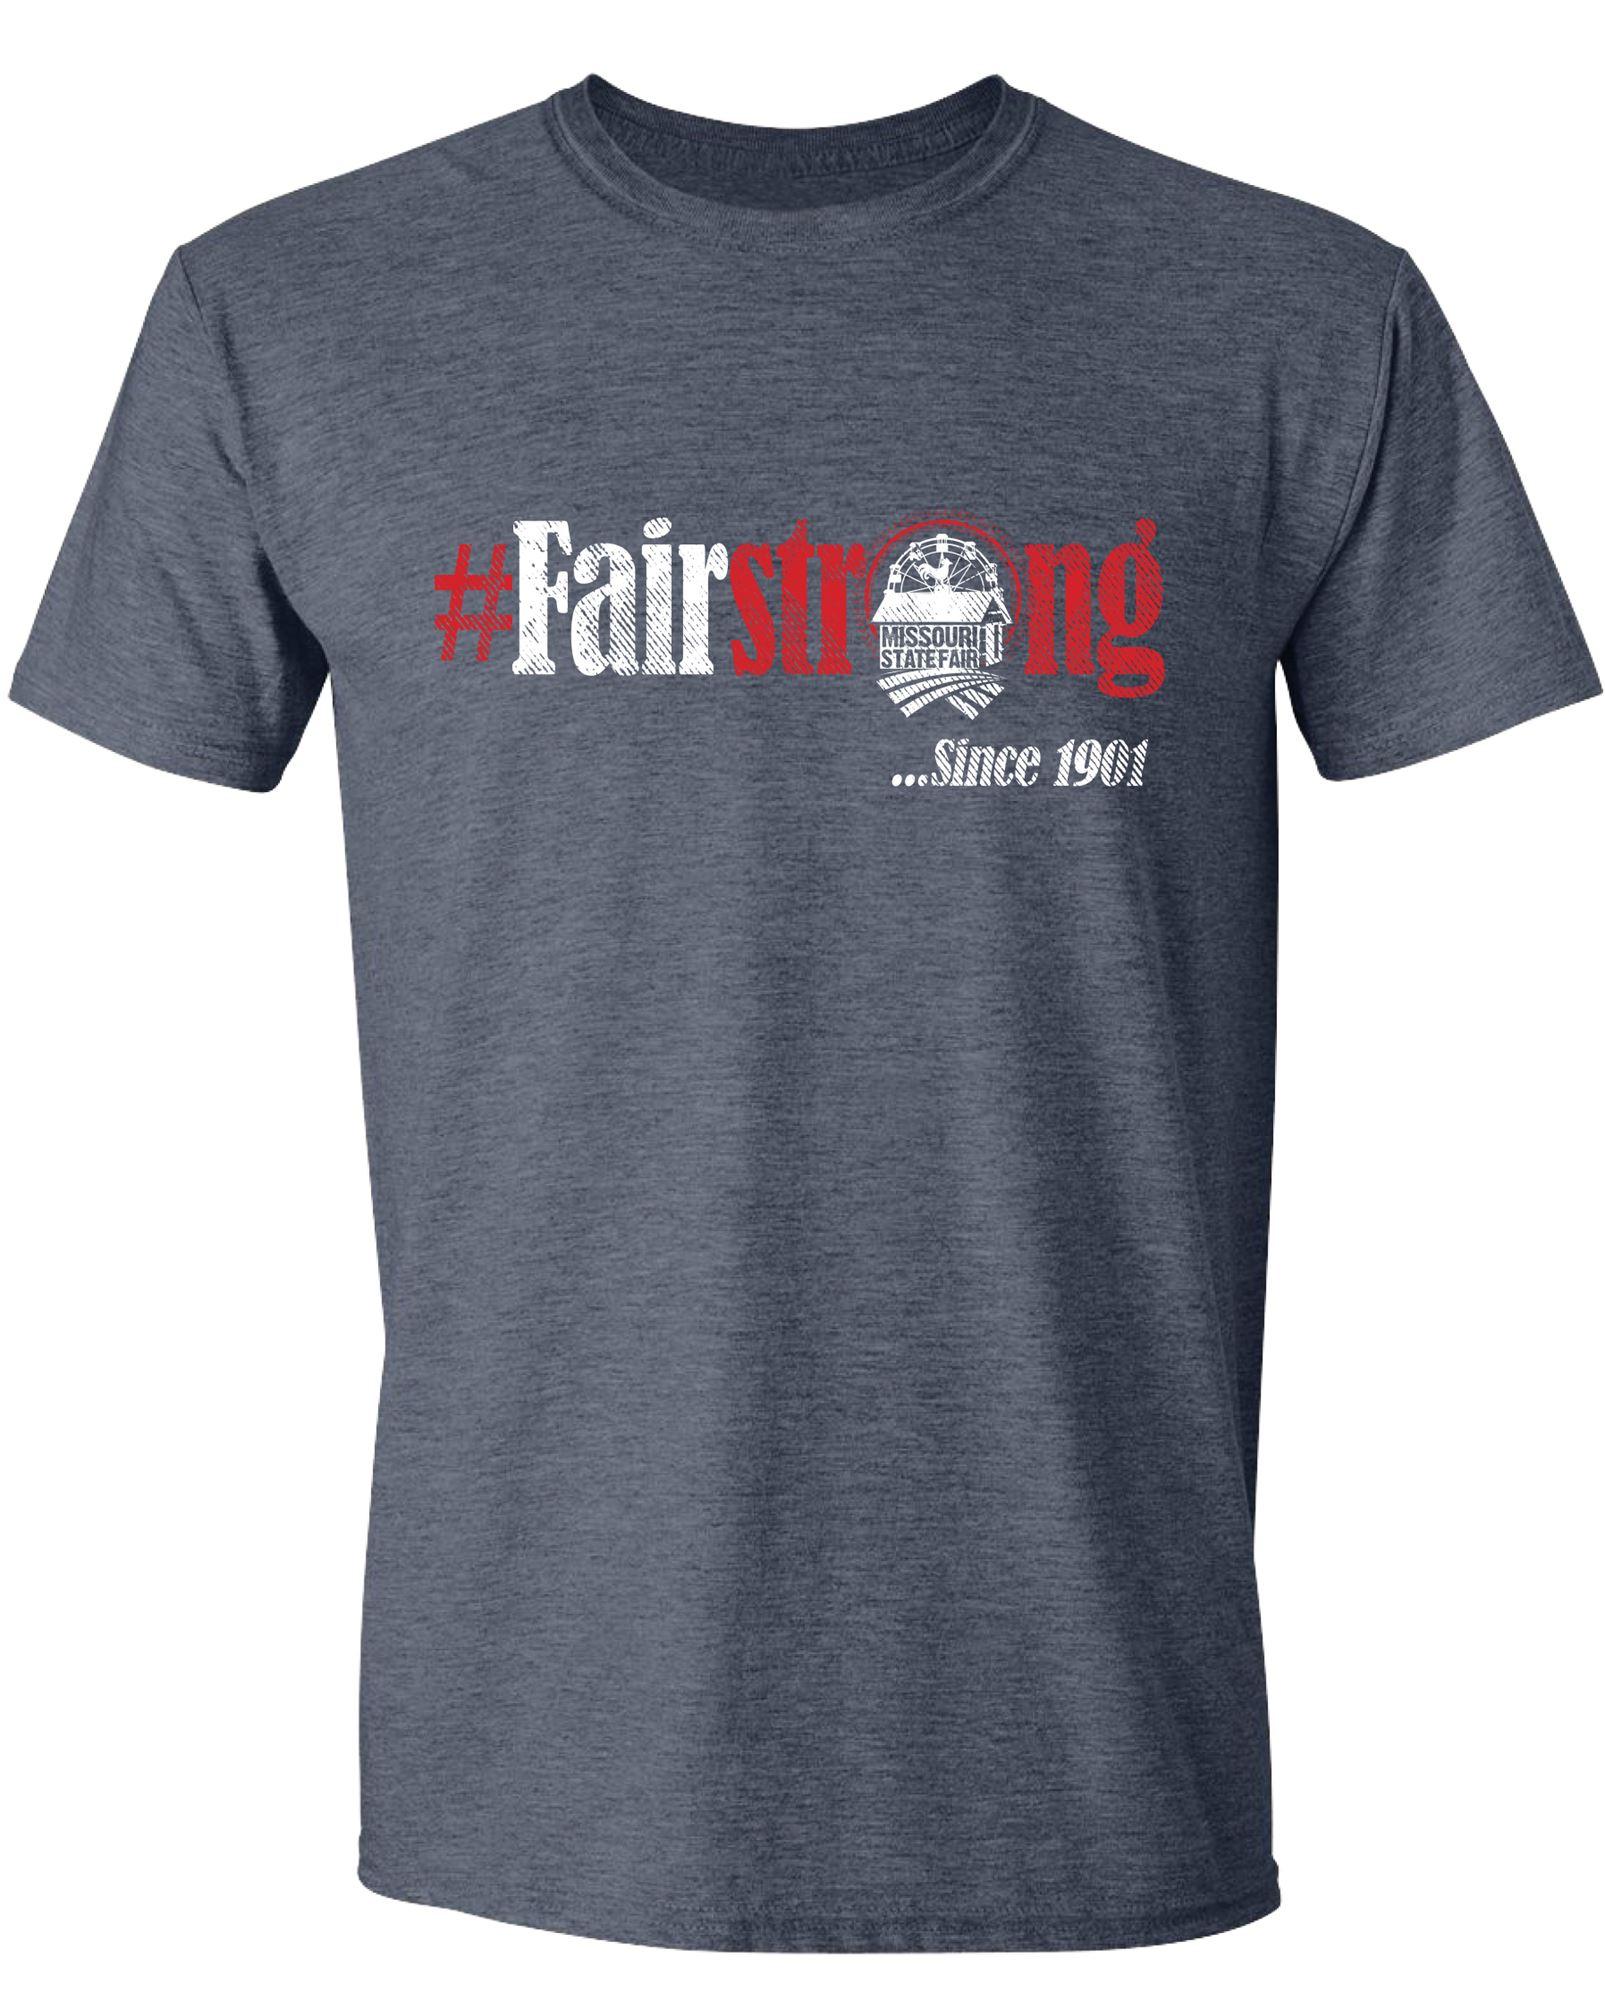 FairStrong